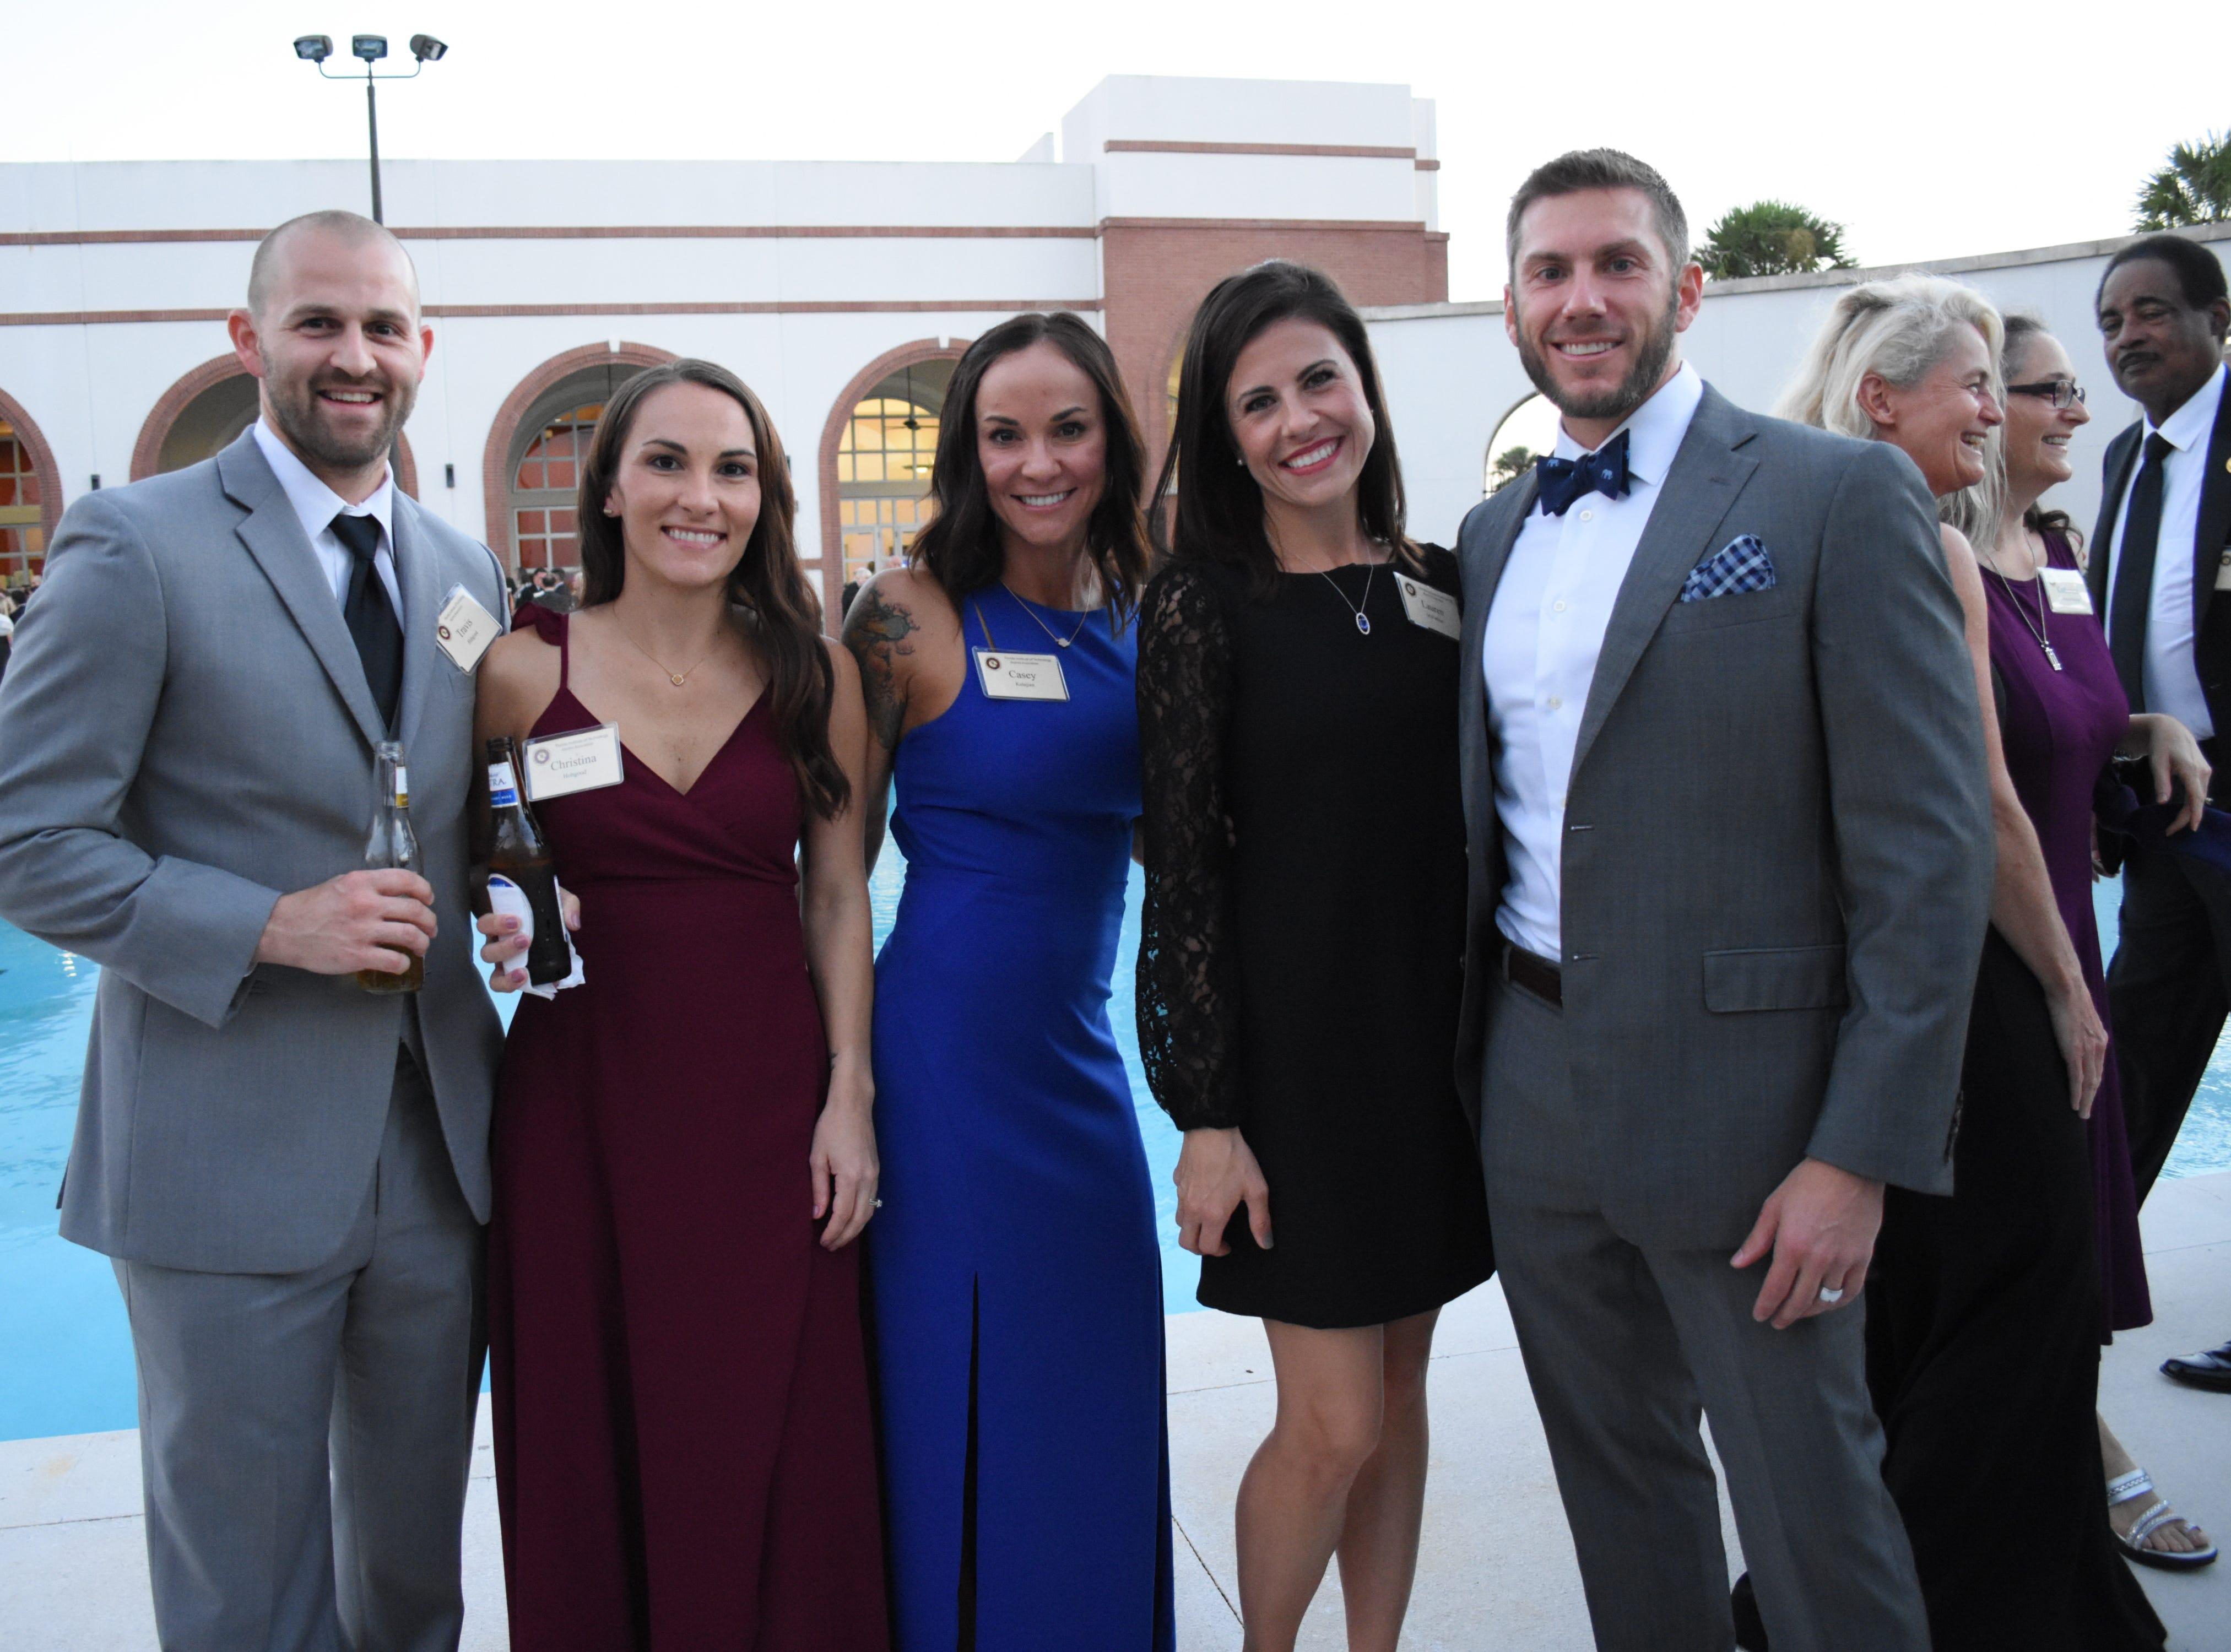 Travis and Cristina Hobgood, Casey Kalajian, Lauren and Hugh McFadden at Florida Tech's 60th Anniversary Homecoming Gala Oct. 13, 2018, at the Clemente Center.